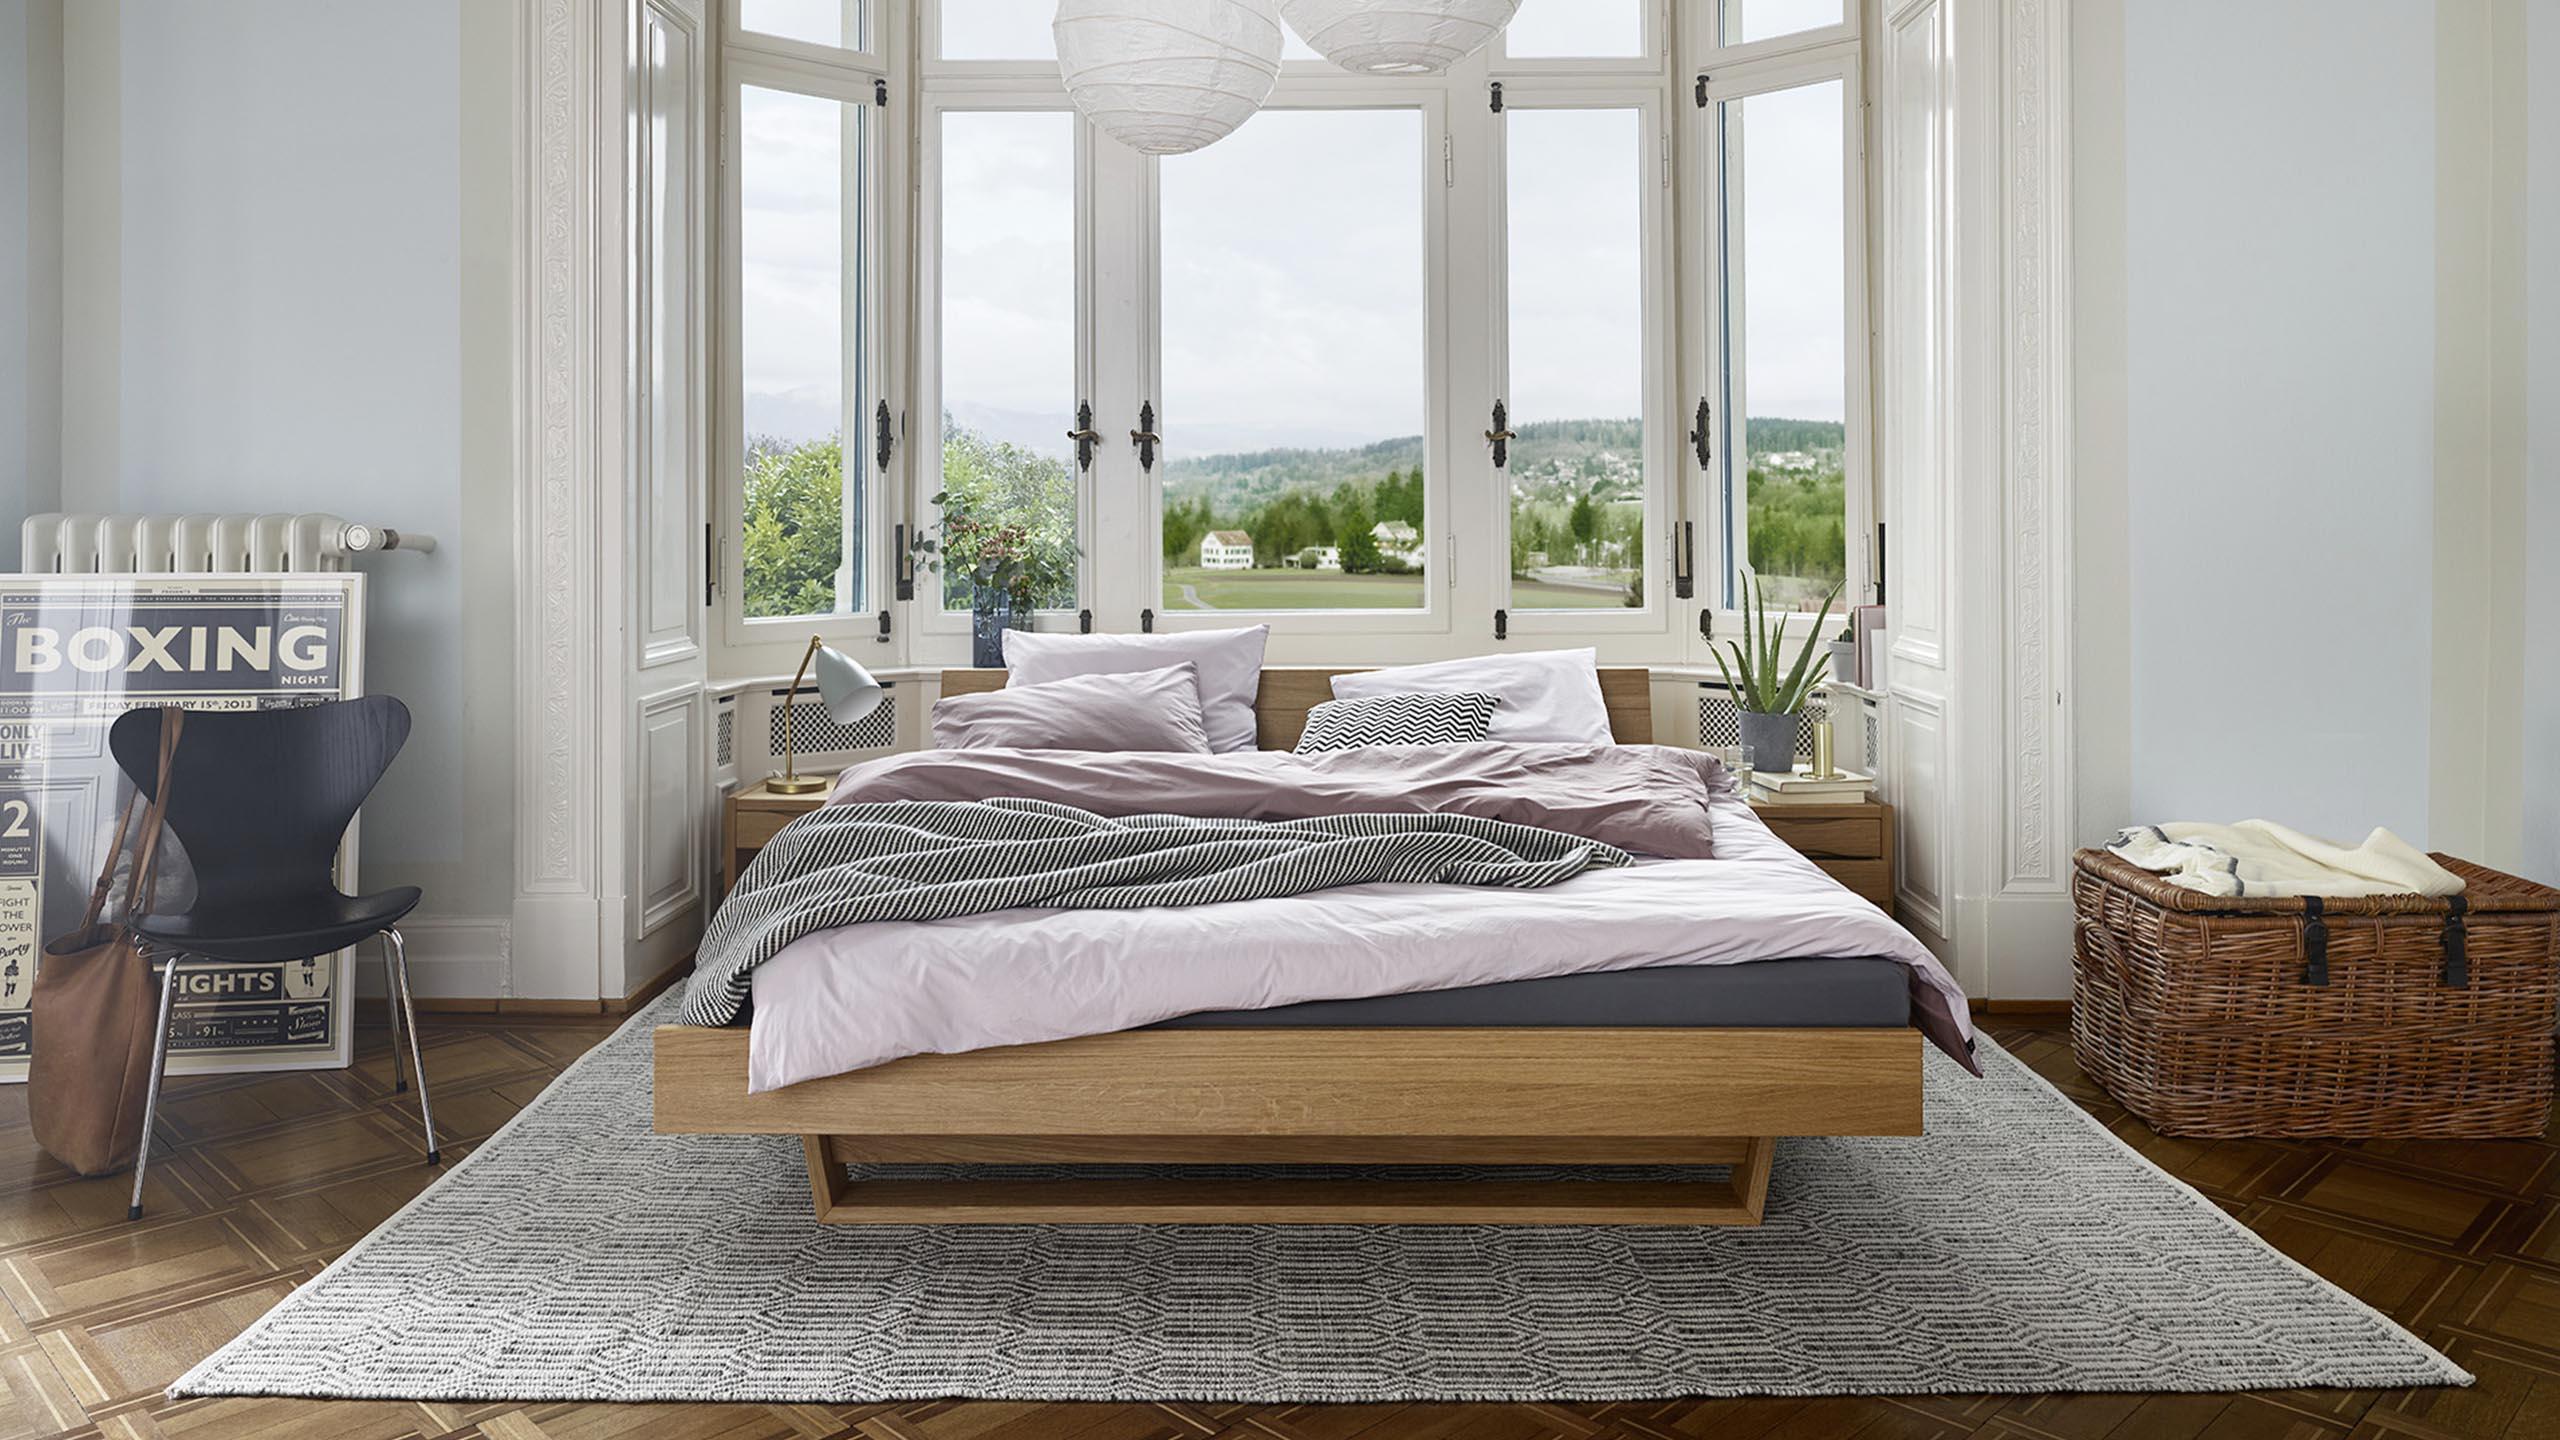 h sler nest center bern solothurn luzern zug z rich chur. Black Bedroom Furniture Sets. Home Design Ideas